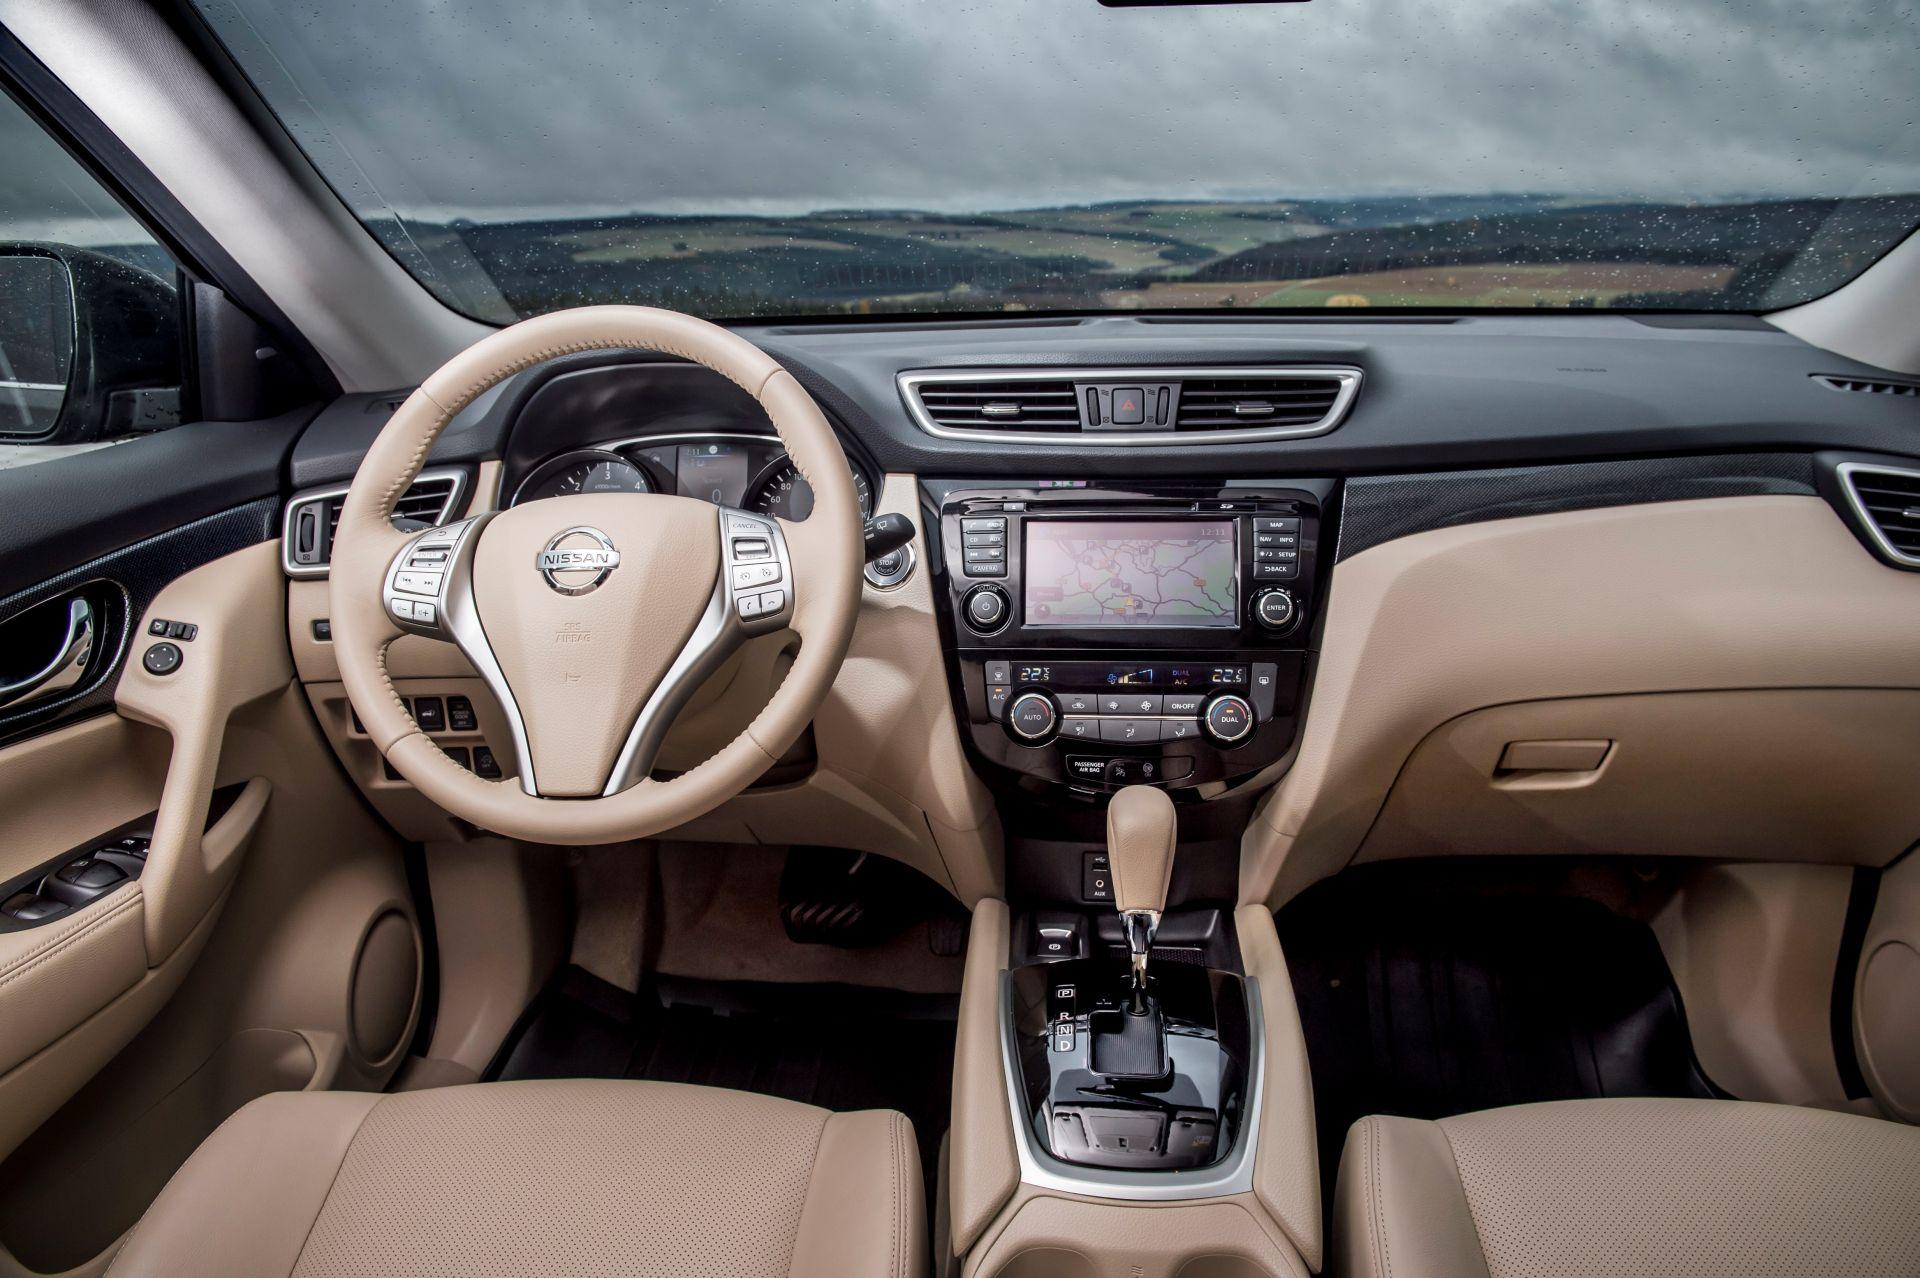 Nissan X-Trail Innenraum beige — Ubi Testet